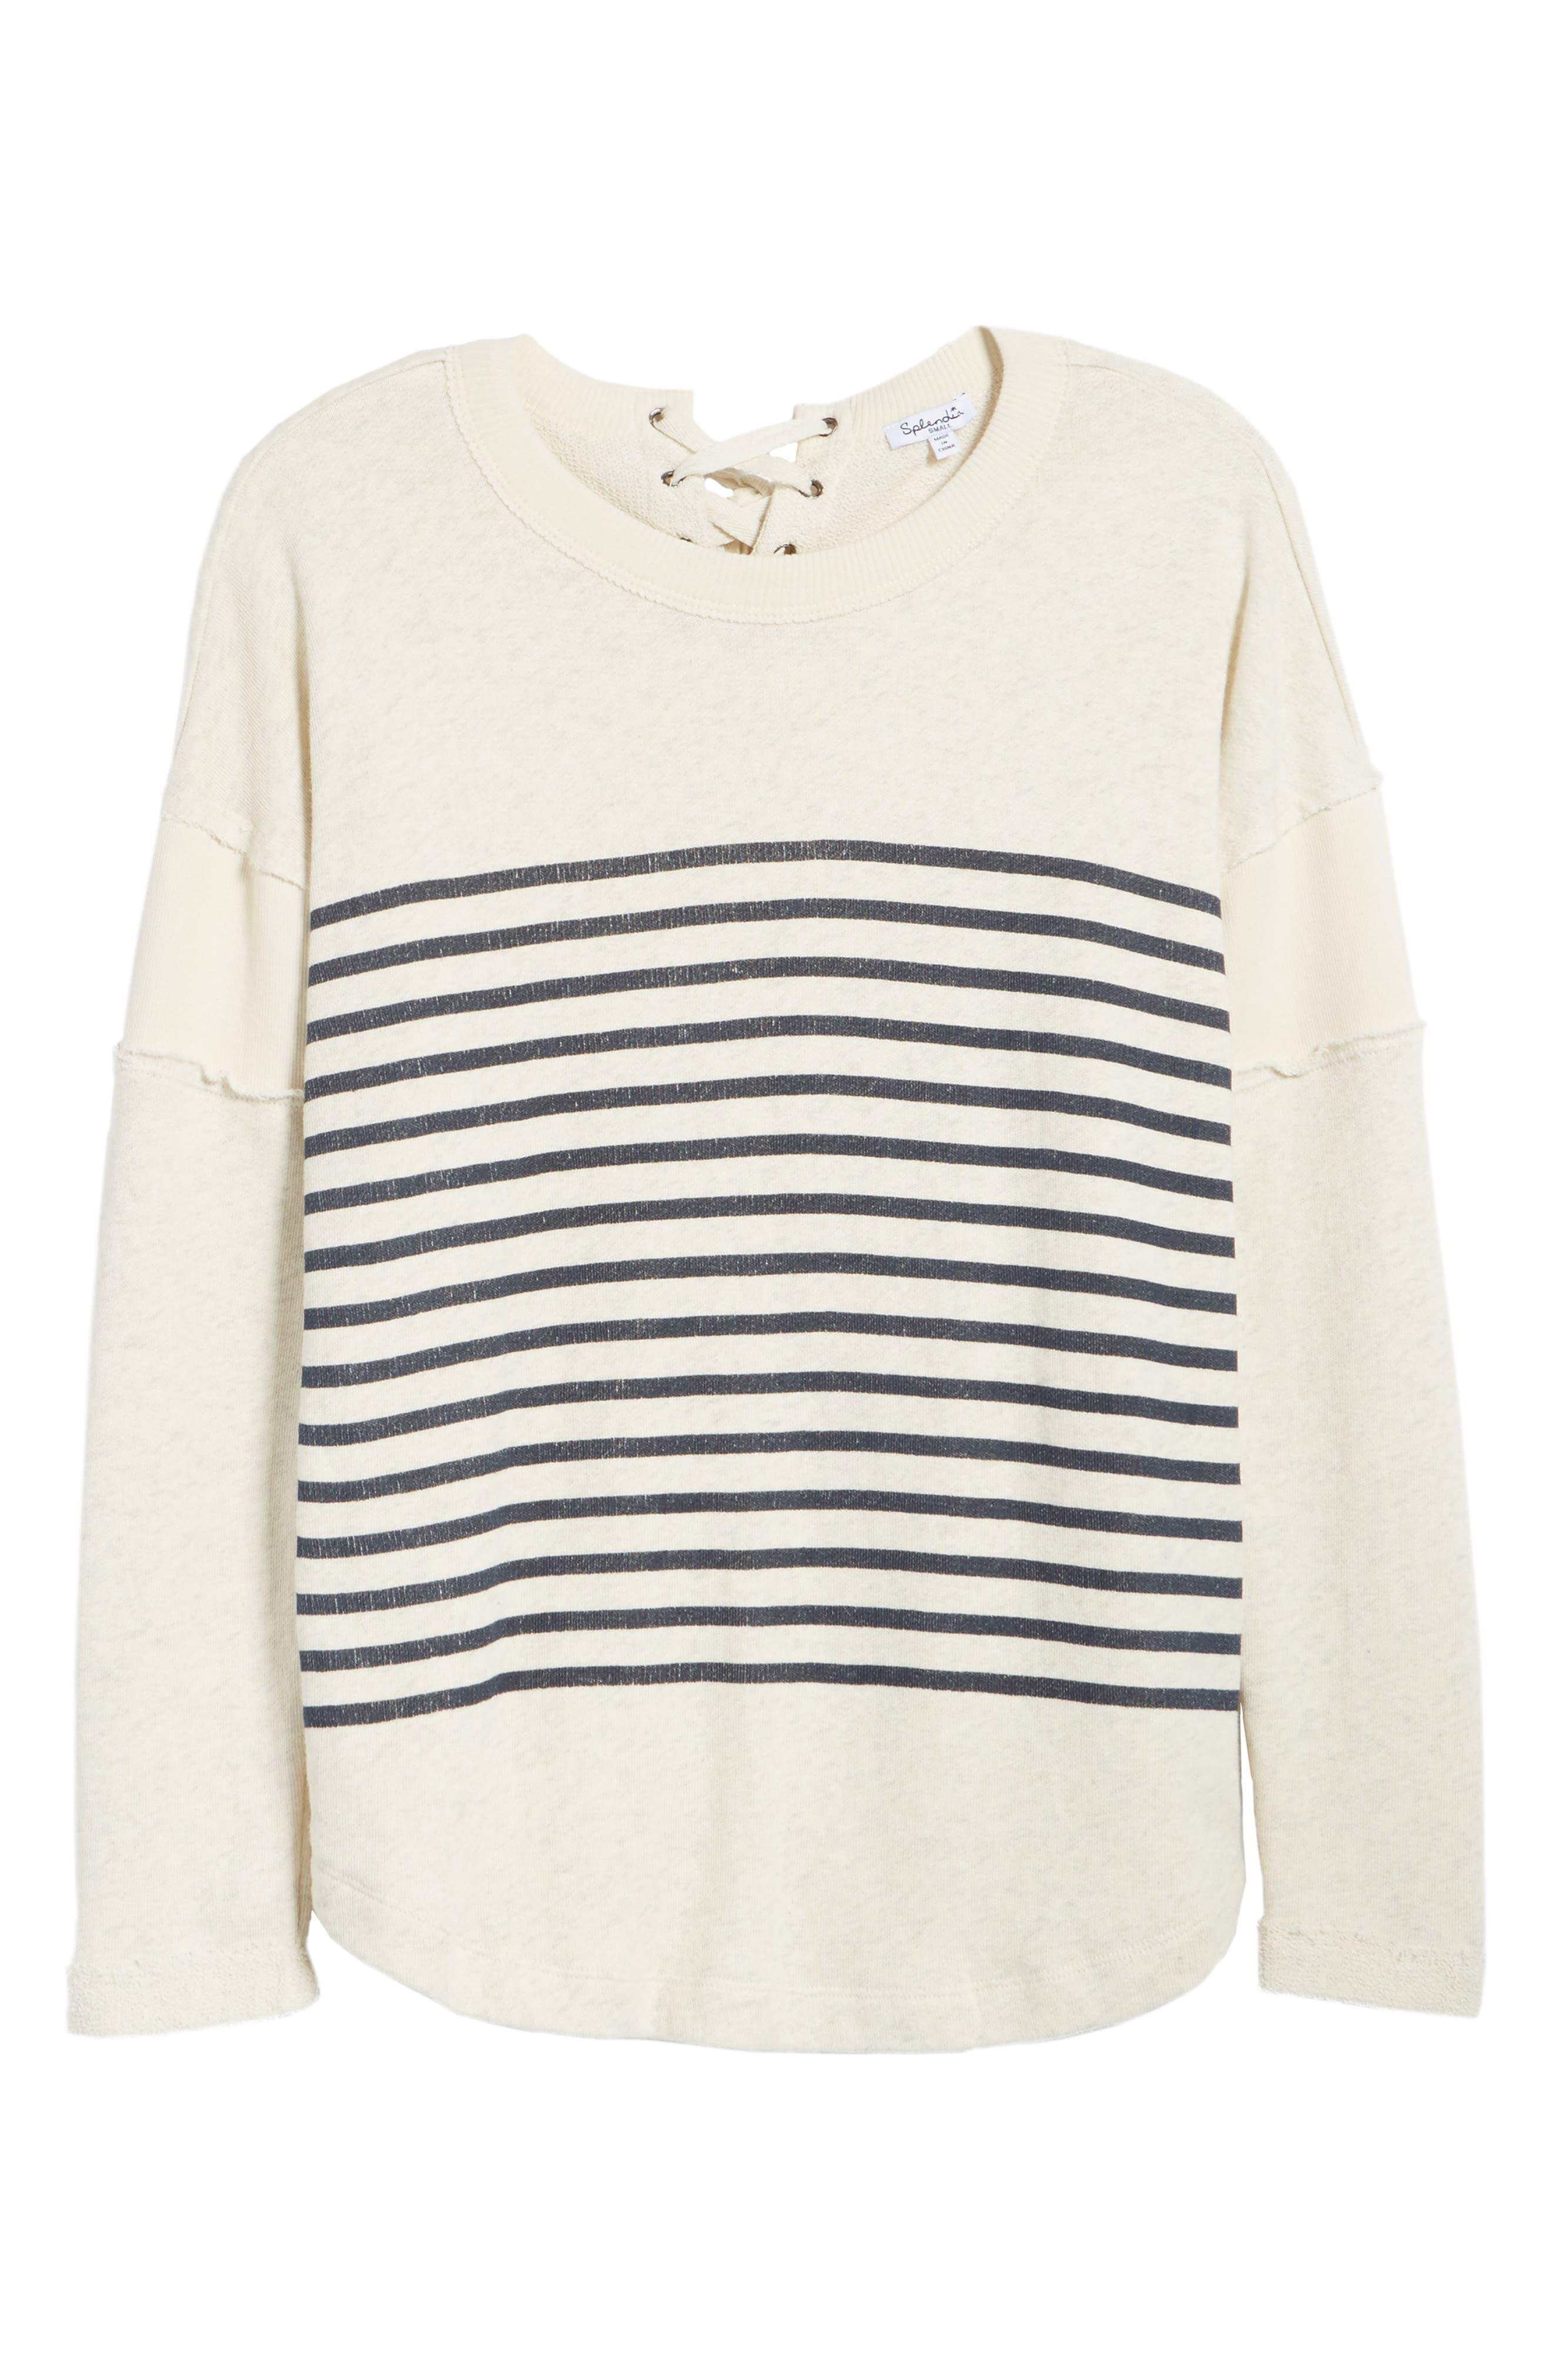 Seabrook Stripe Sweatshirt,                             Alternate thumbnail 6, color,